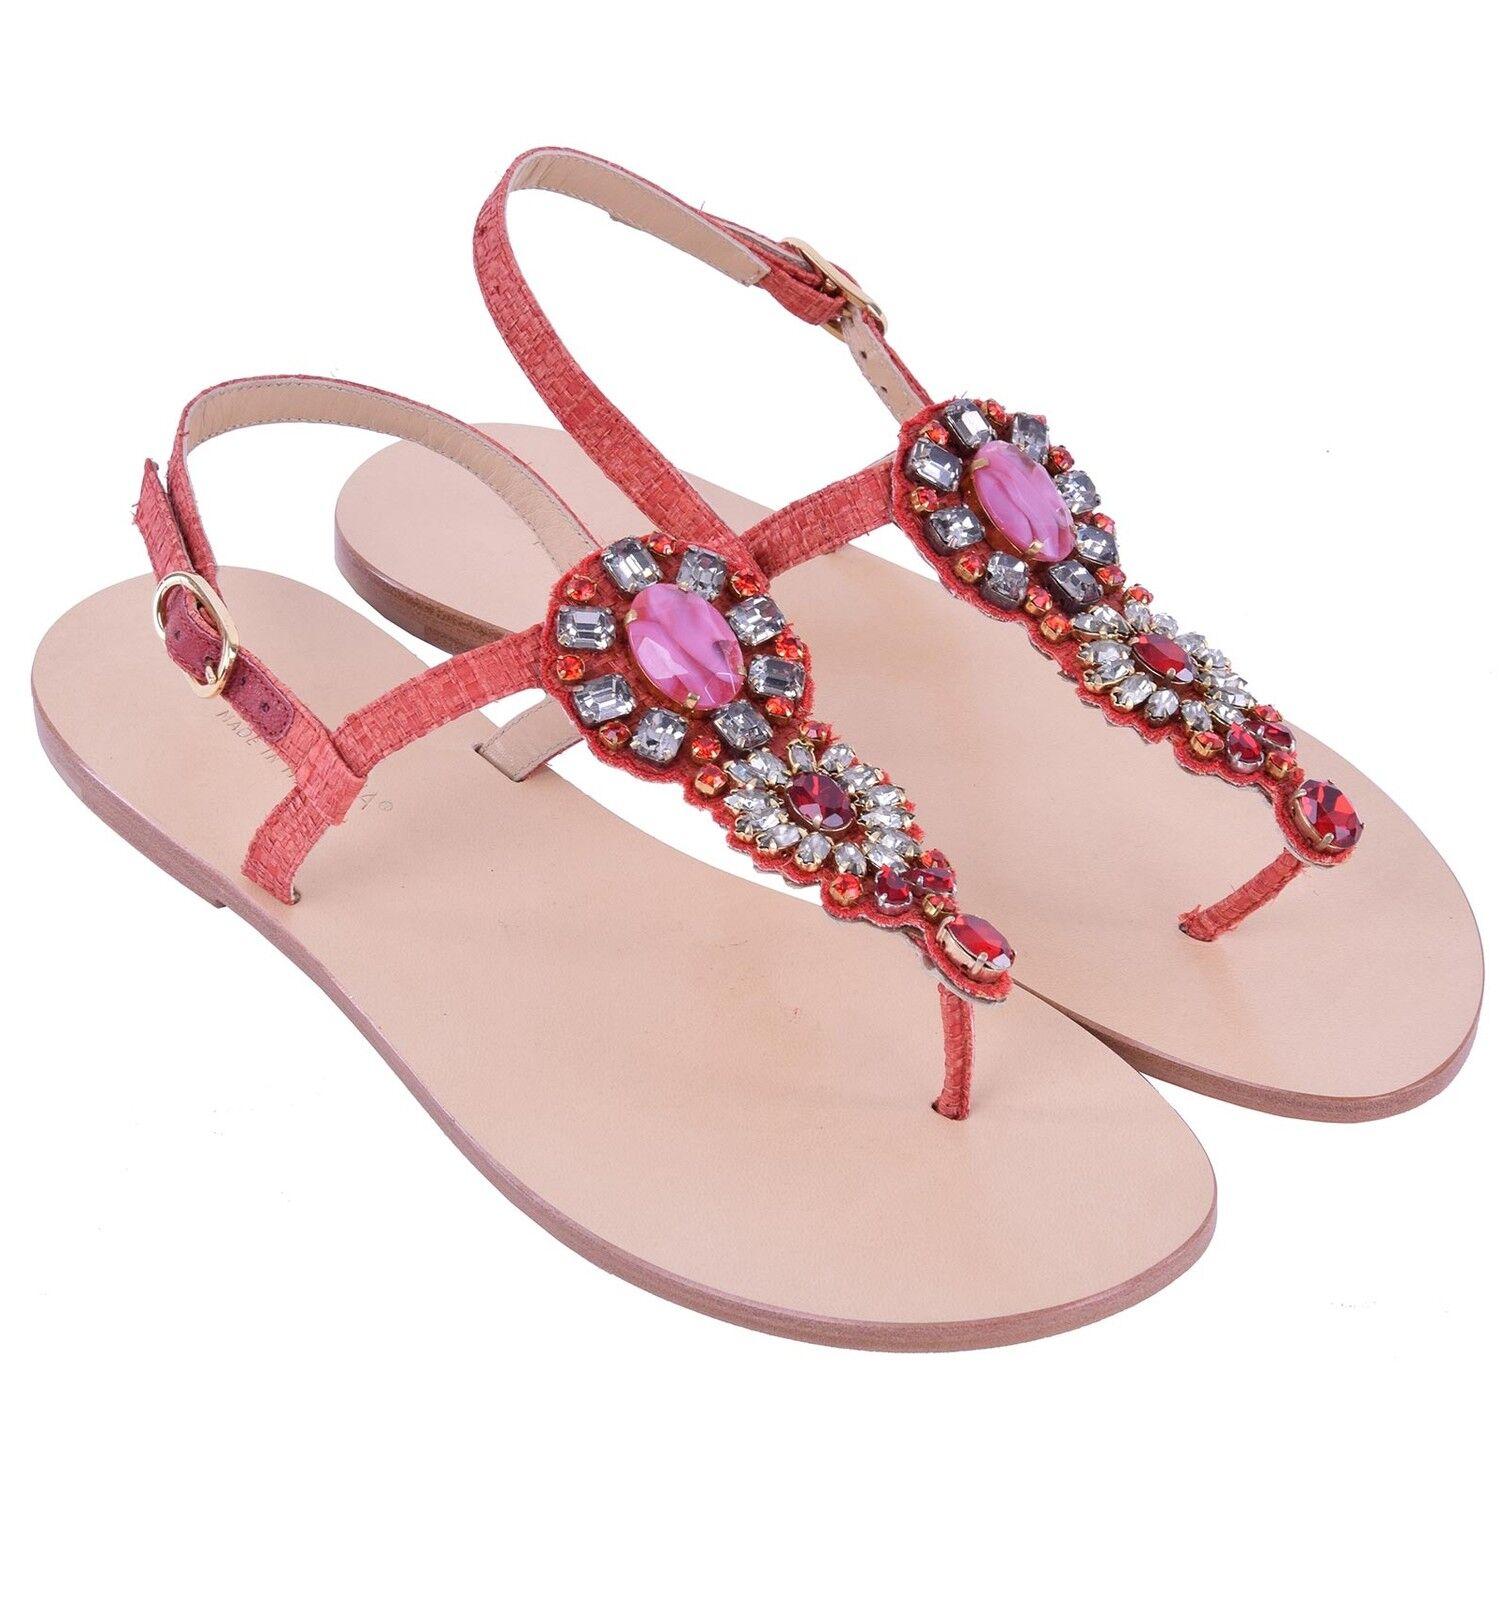 DOLCE & GABBANA Flache Sandalen mit Kristall Schmuck Rot Schuhe 04319